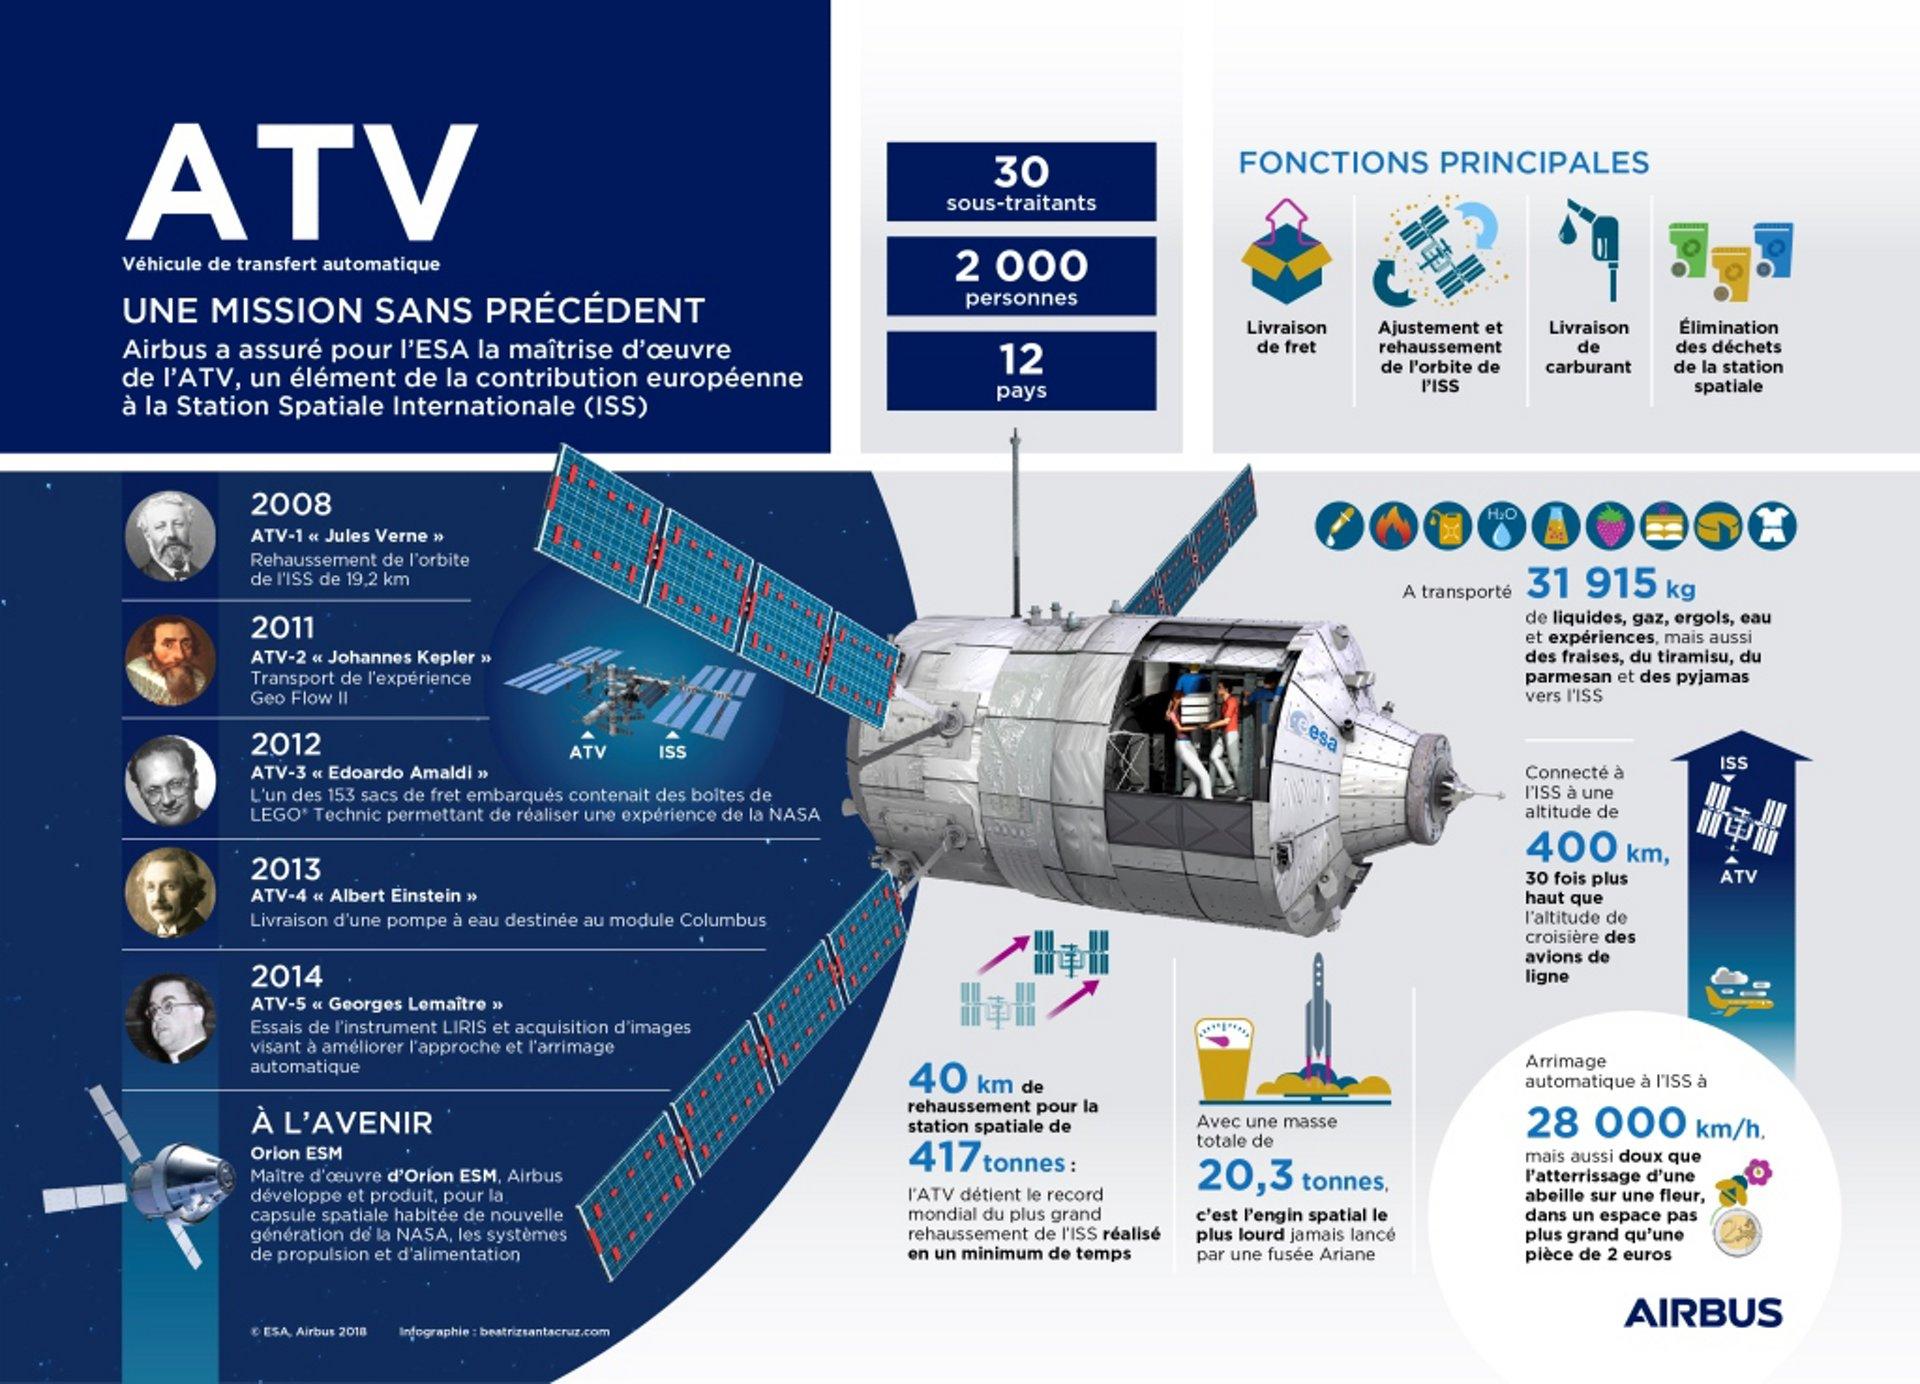 20180305_ATV_Infographic_FR